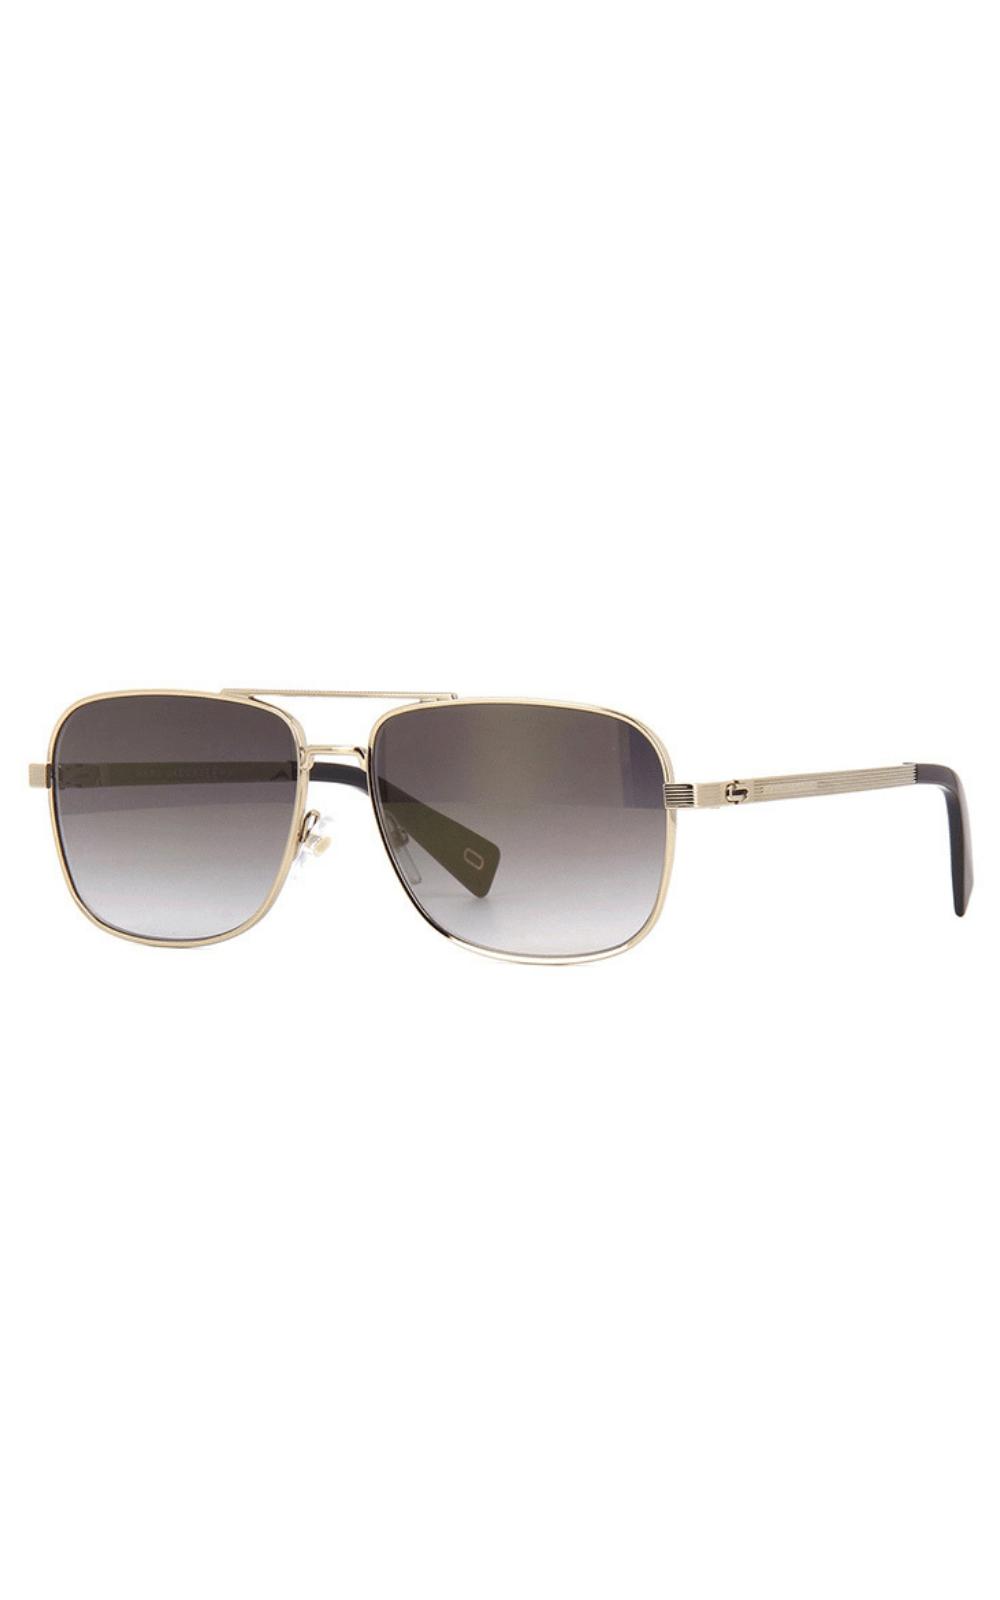 c53f6e2bc10a4 Óculos de Sol Marc Jacobs 241 S J5GFQ. undefined